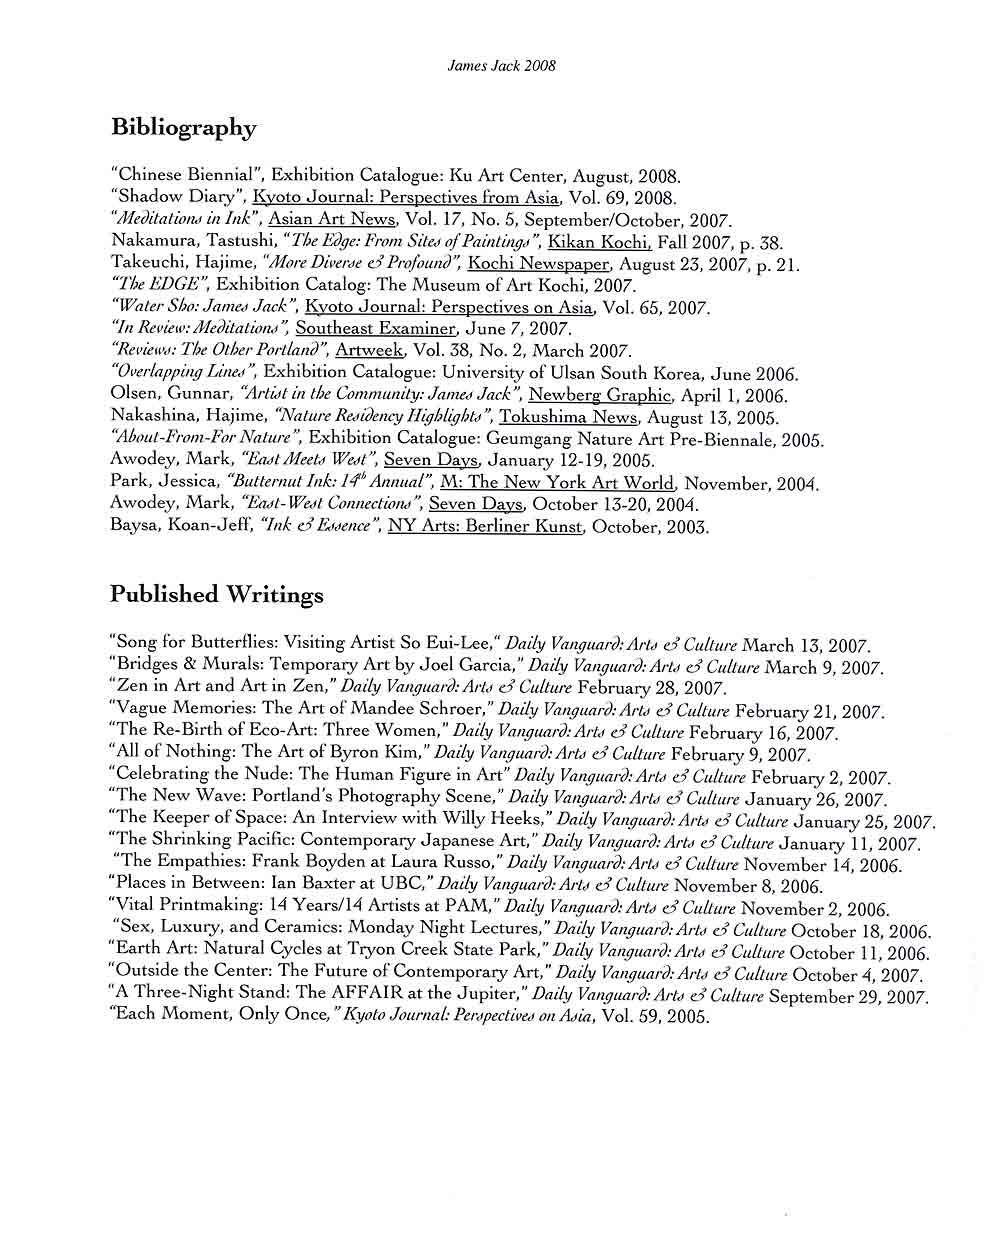 James Jack's Resume, pg 3